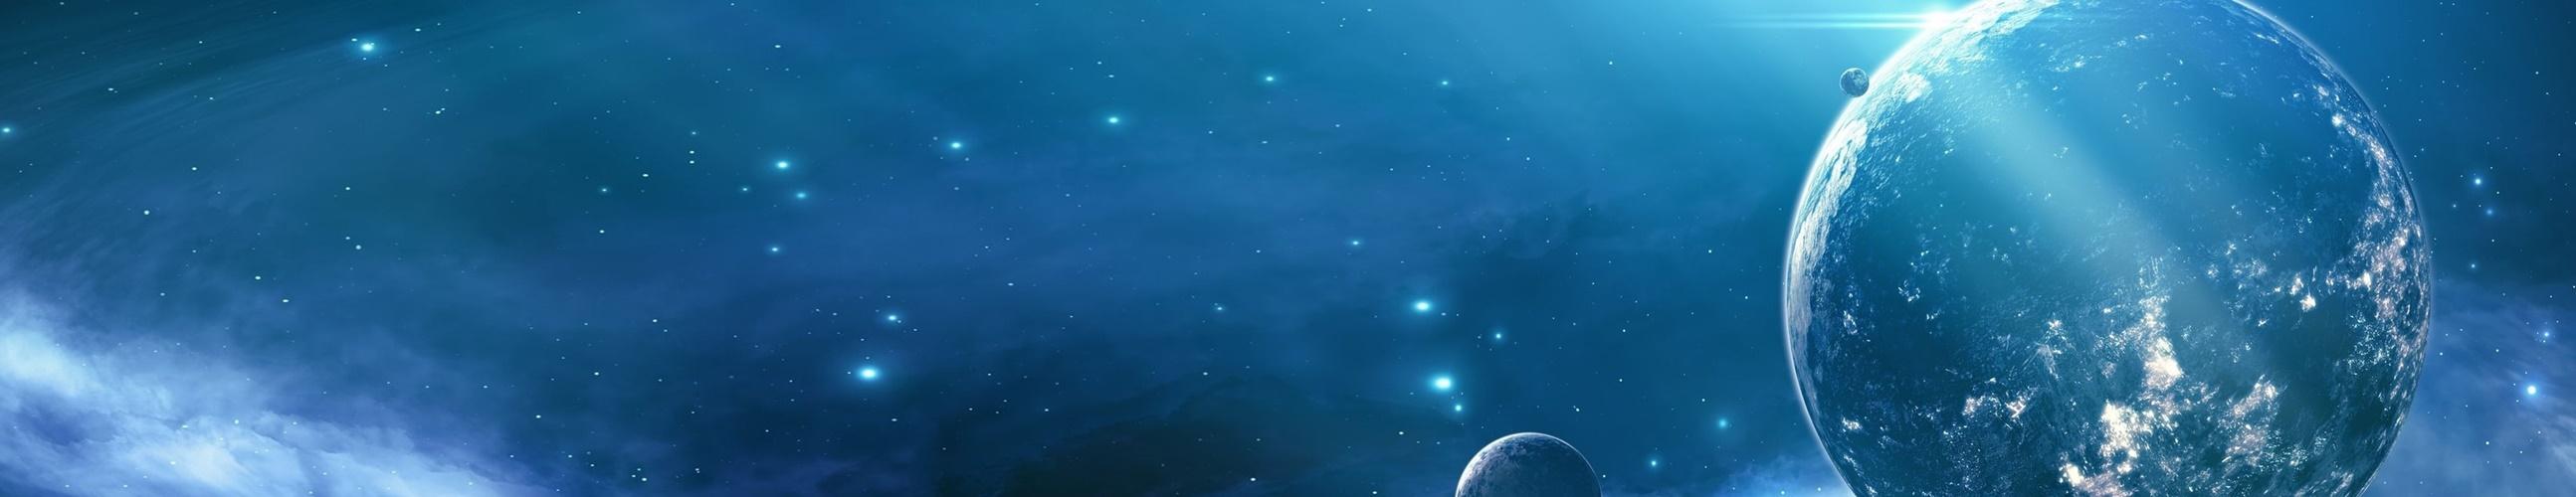 meteorihuela-planetas-